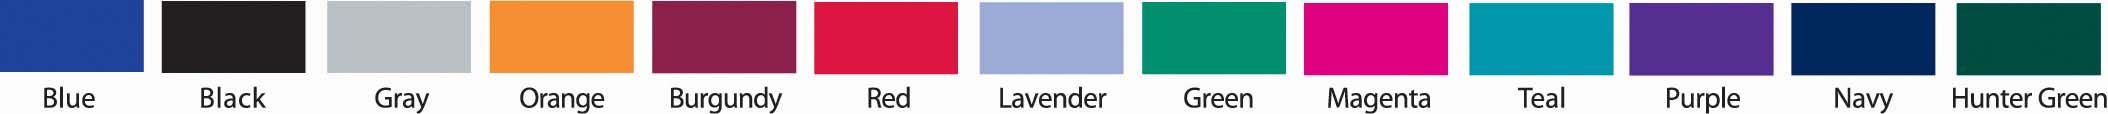 spectrum-dual-head-stethoscope-adult-slider-pack-lavender-10-429-110-lr-2.jpg